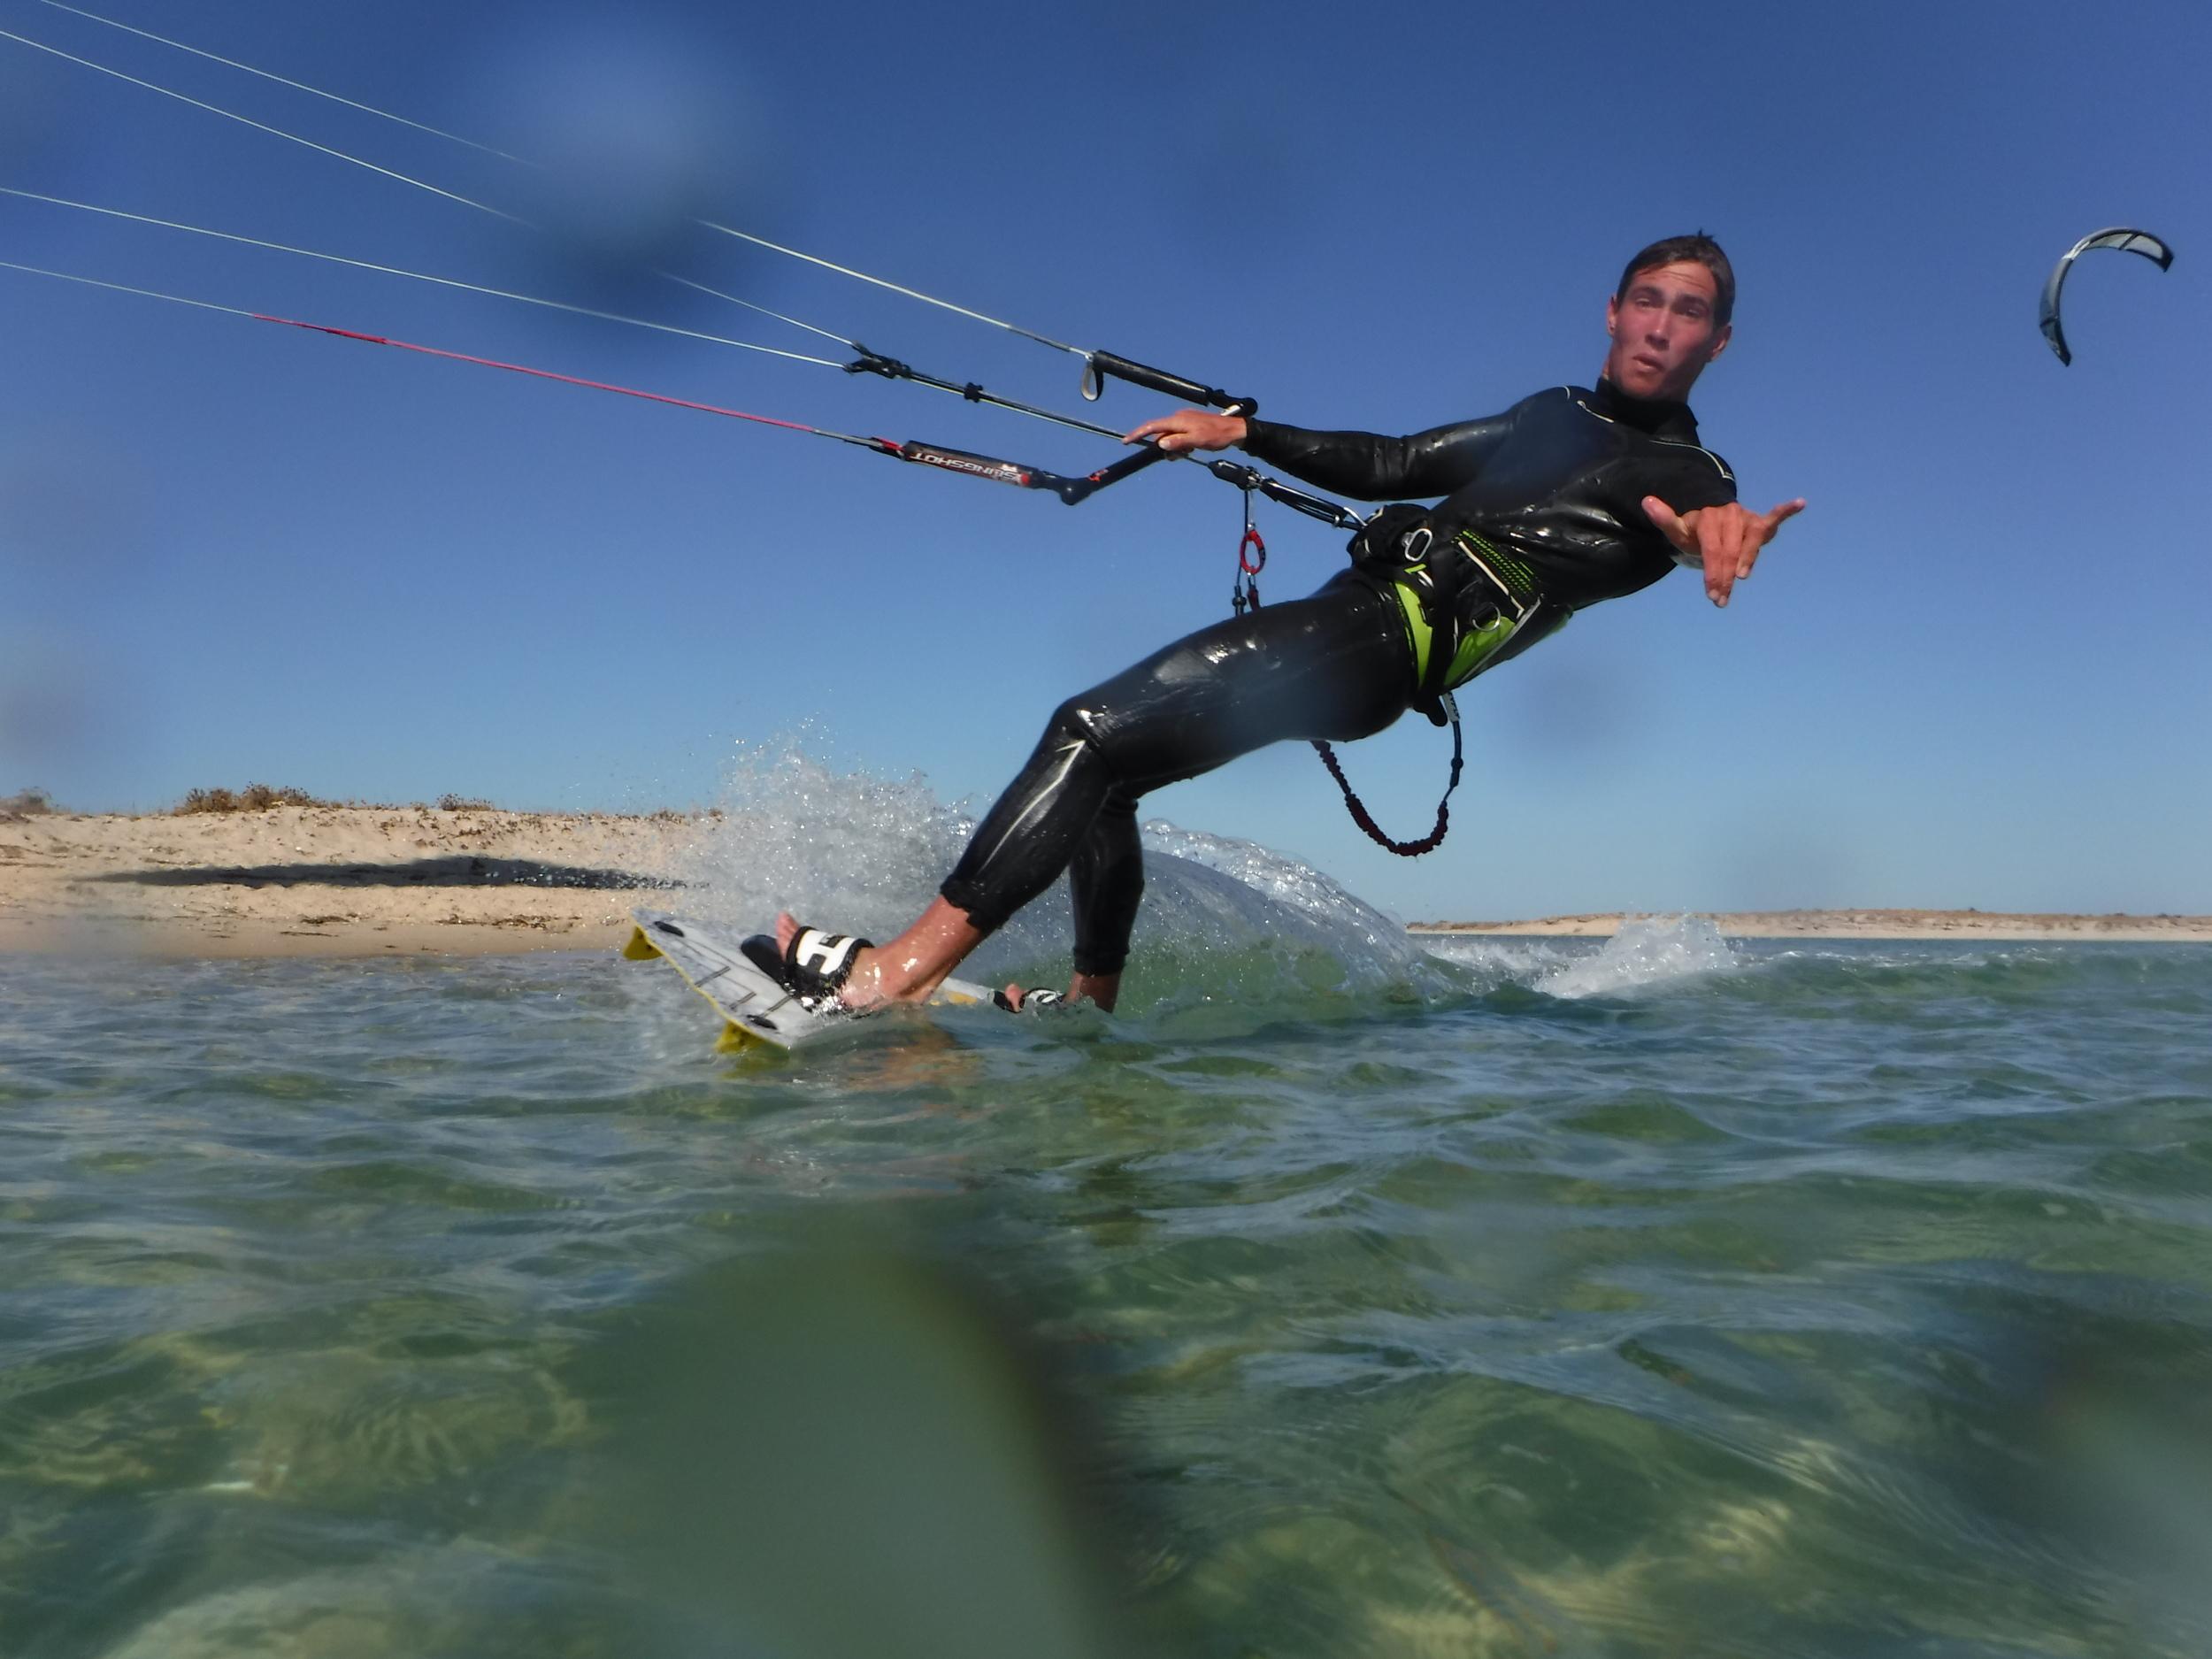 Kitesurfing in our Kiteboarding Paradise at Fuzeta, in the Ria Formosa, near Faro and Tavira in the Algarve, Portugal